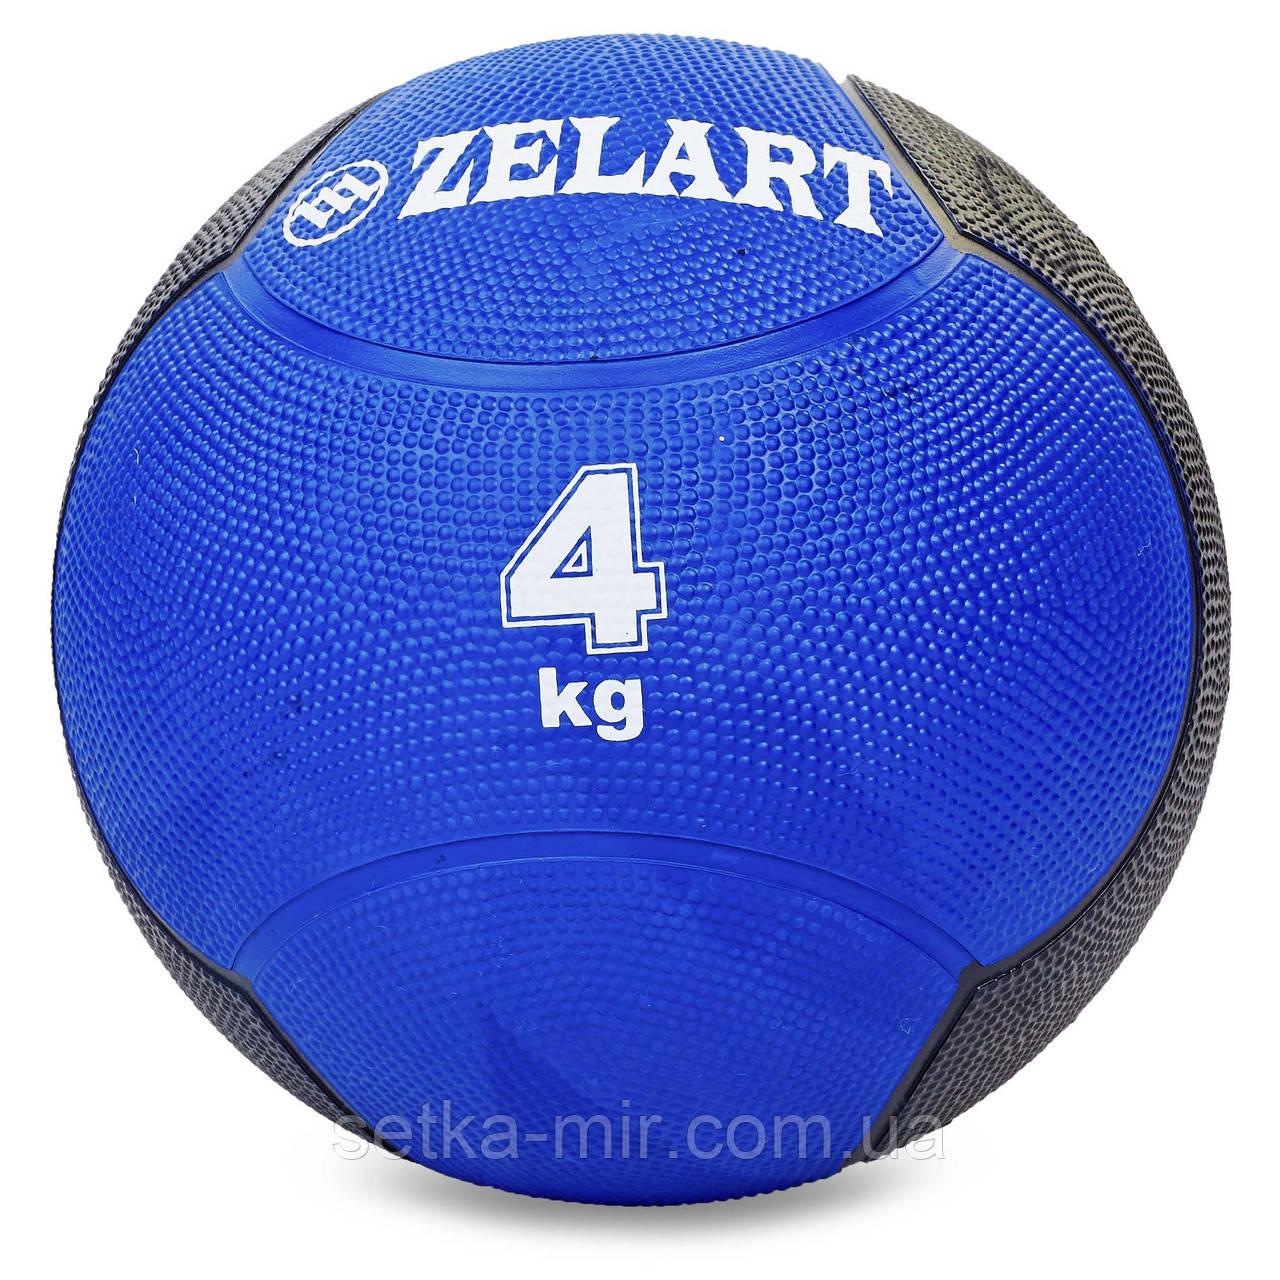 М'яч медичний медбол Zelart Medicine Ball FI-5121-4 4кг